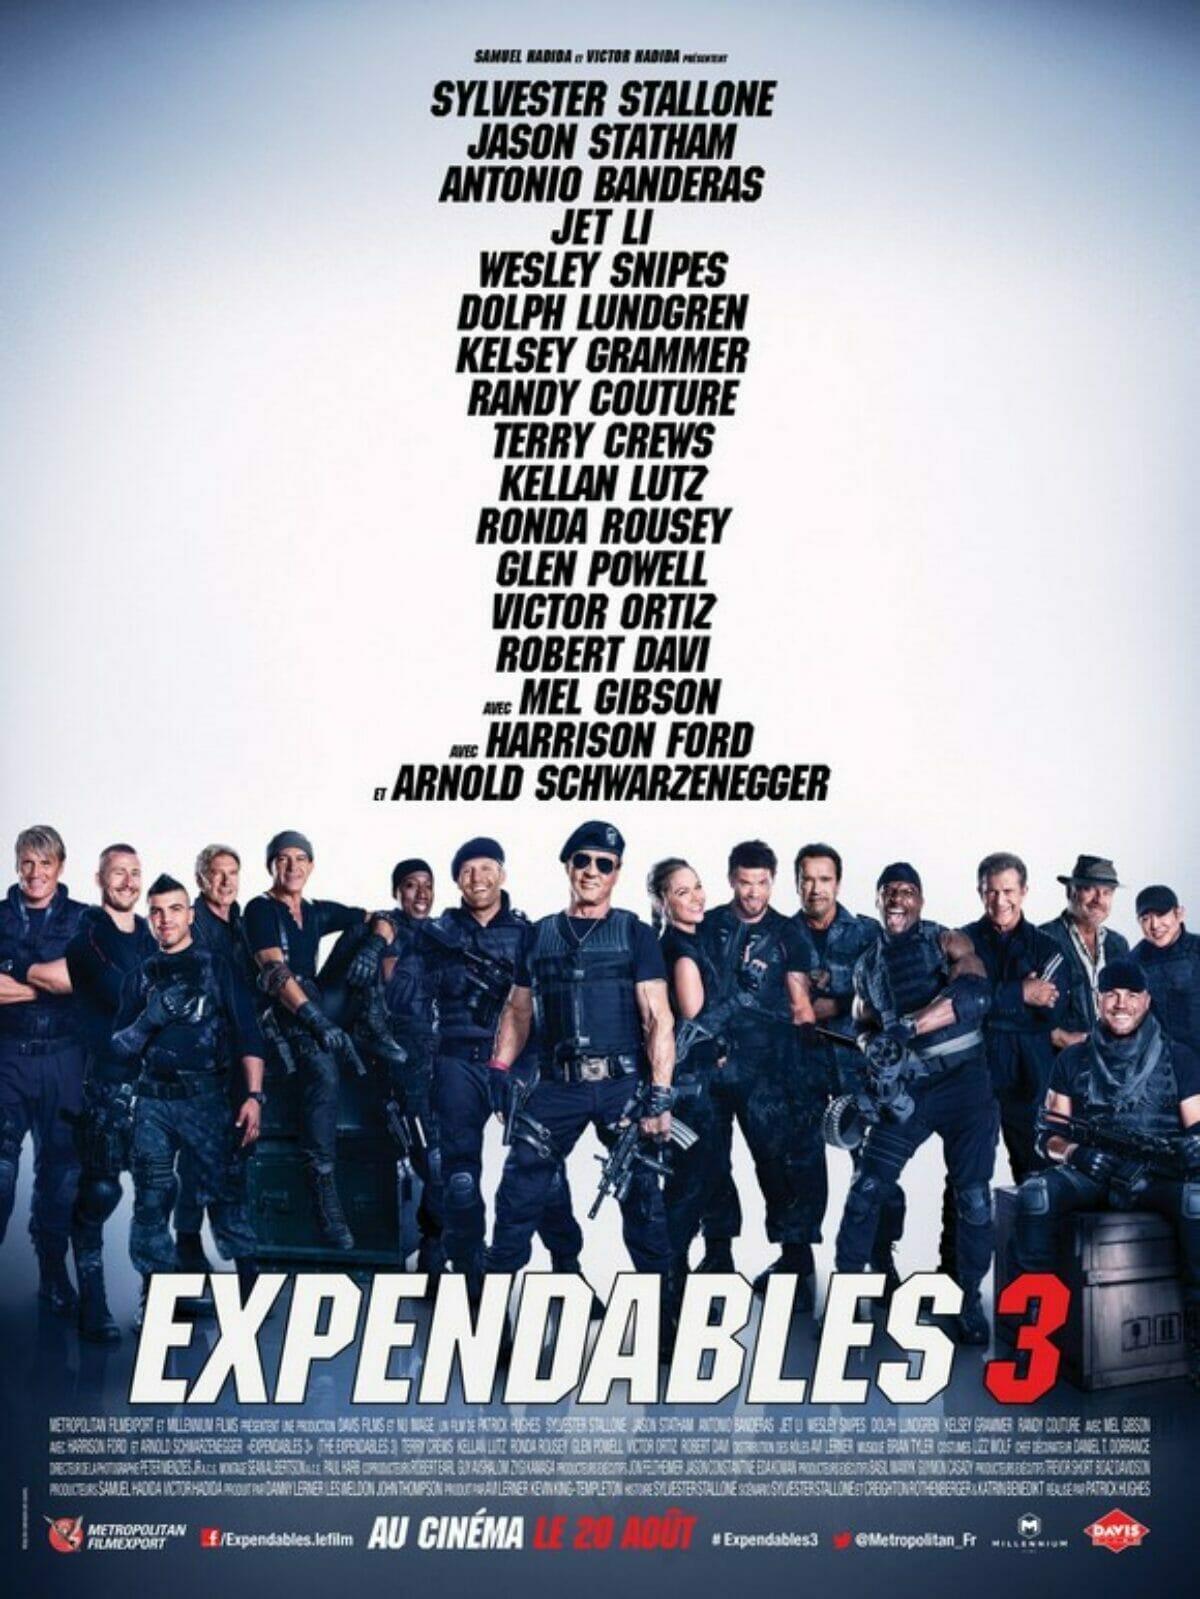 Expendables3-affiche-france